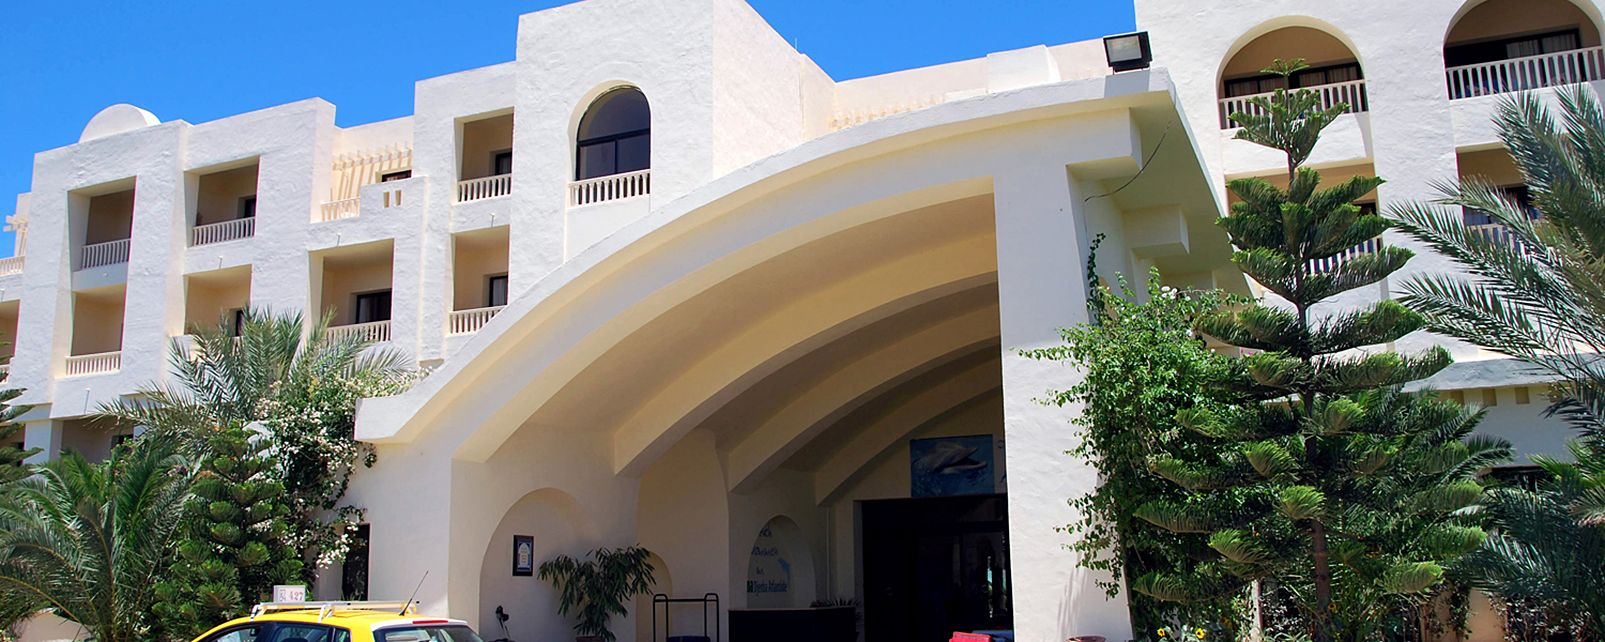 Hotel Aldiana Atlantide